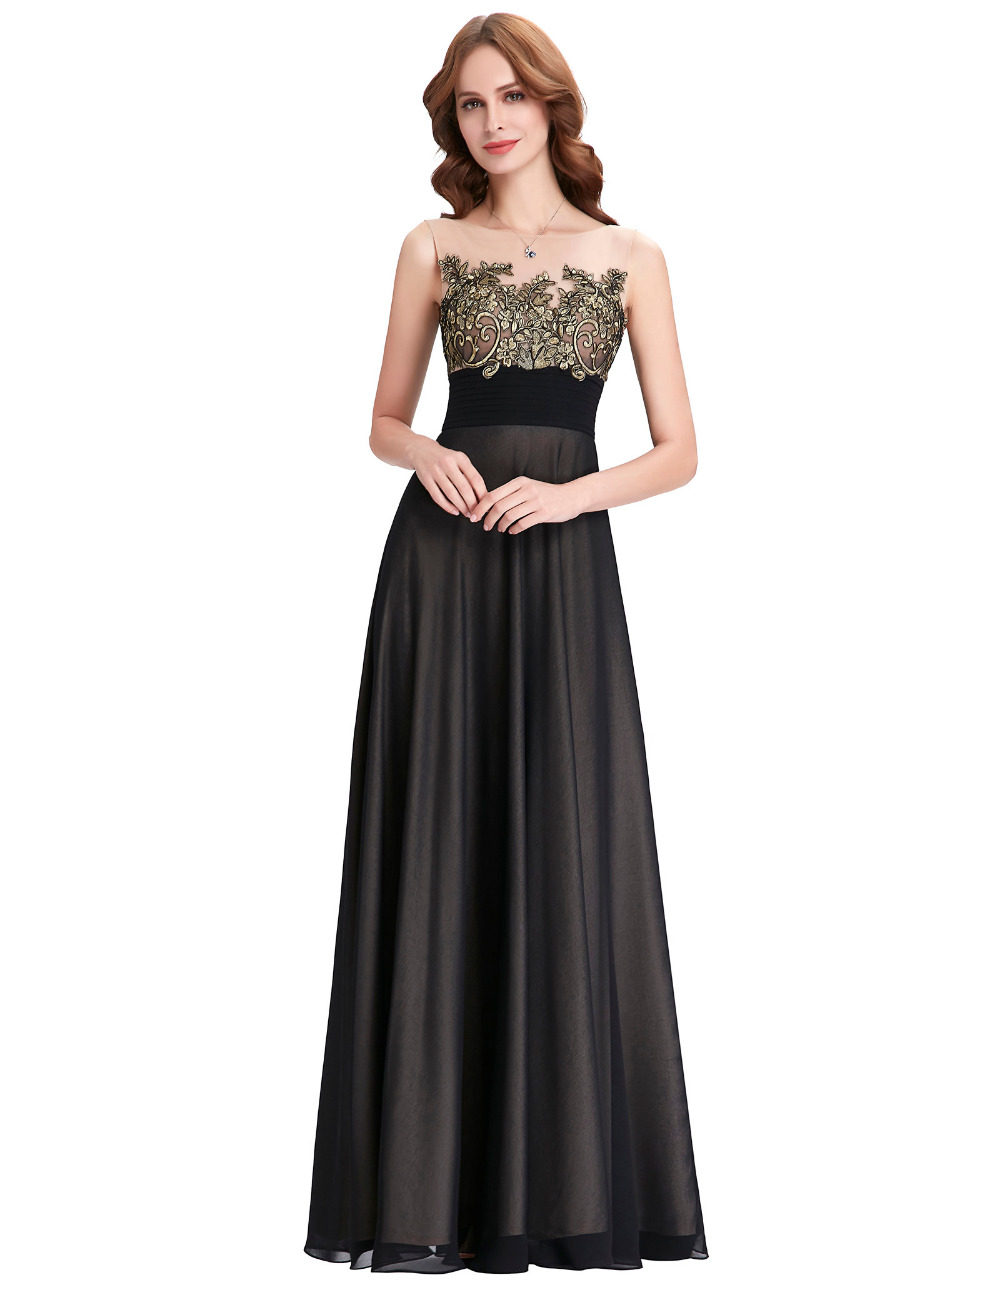 Long Junior Dresses Promotion-Shop for Promotional Long Junior ...